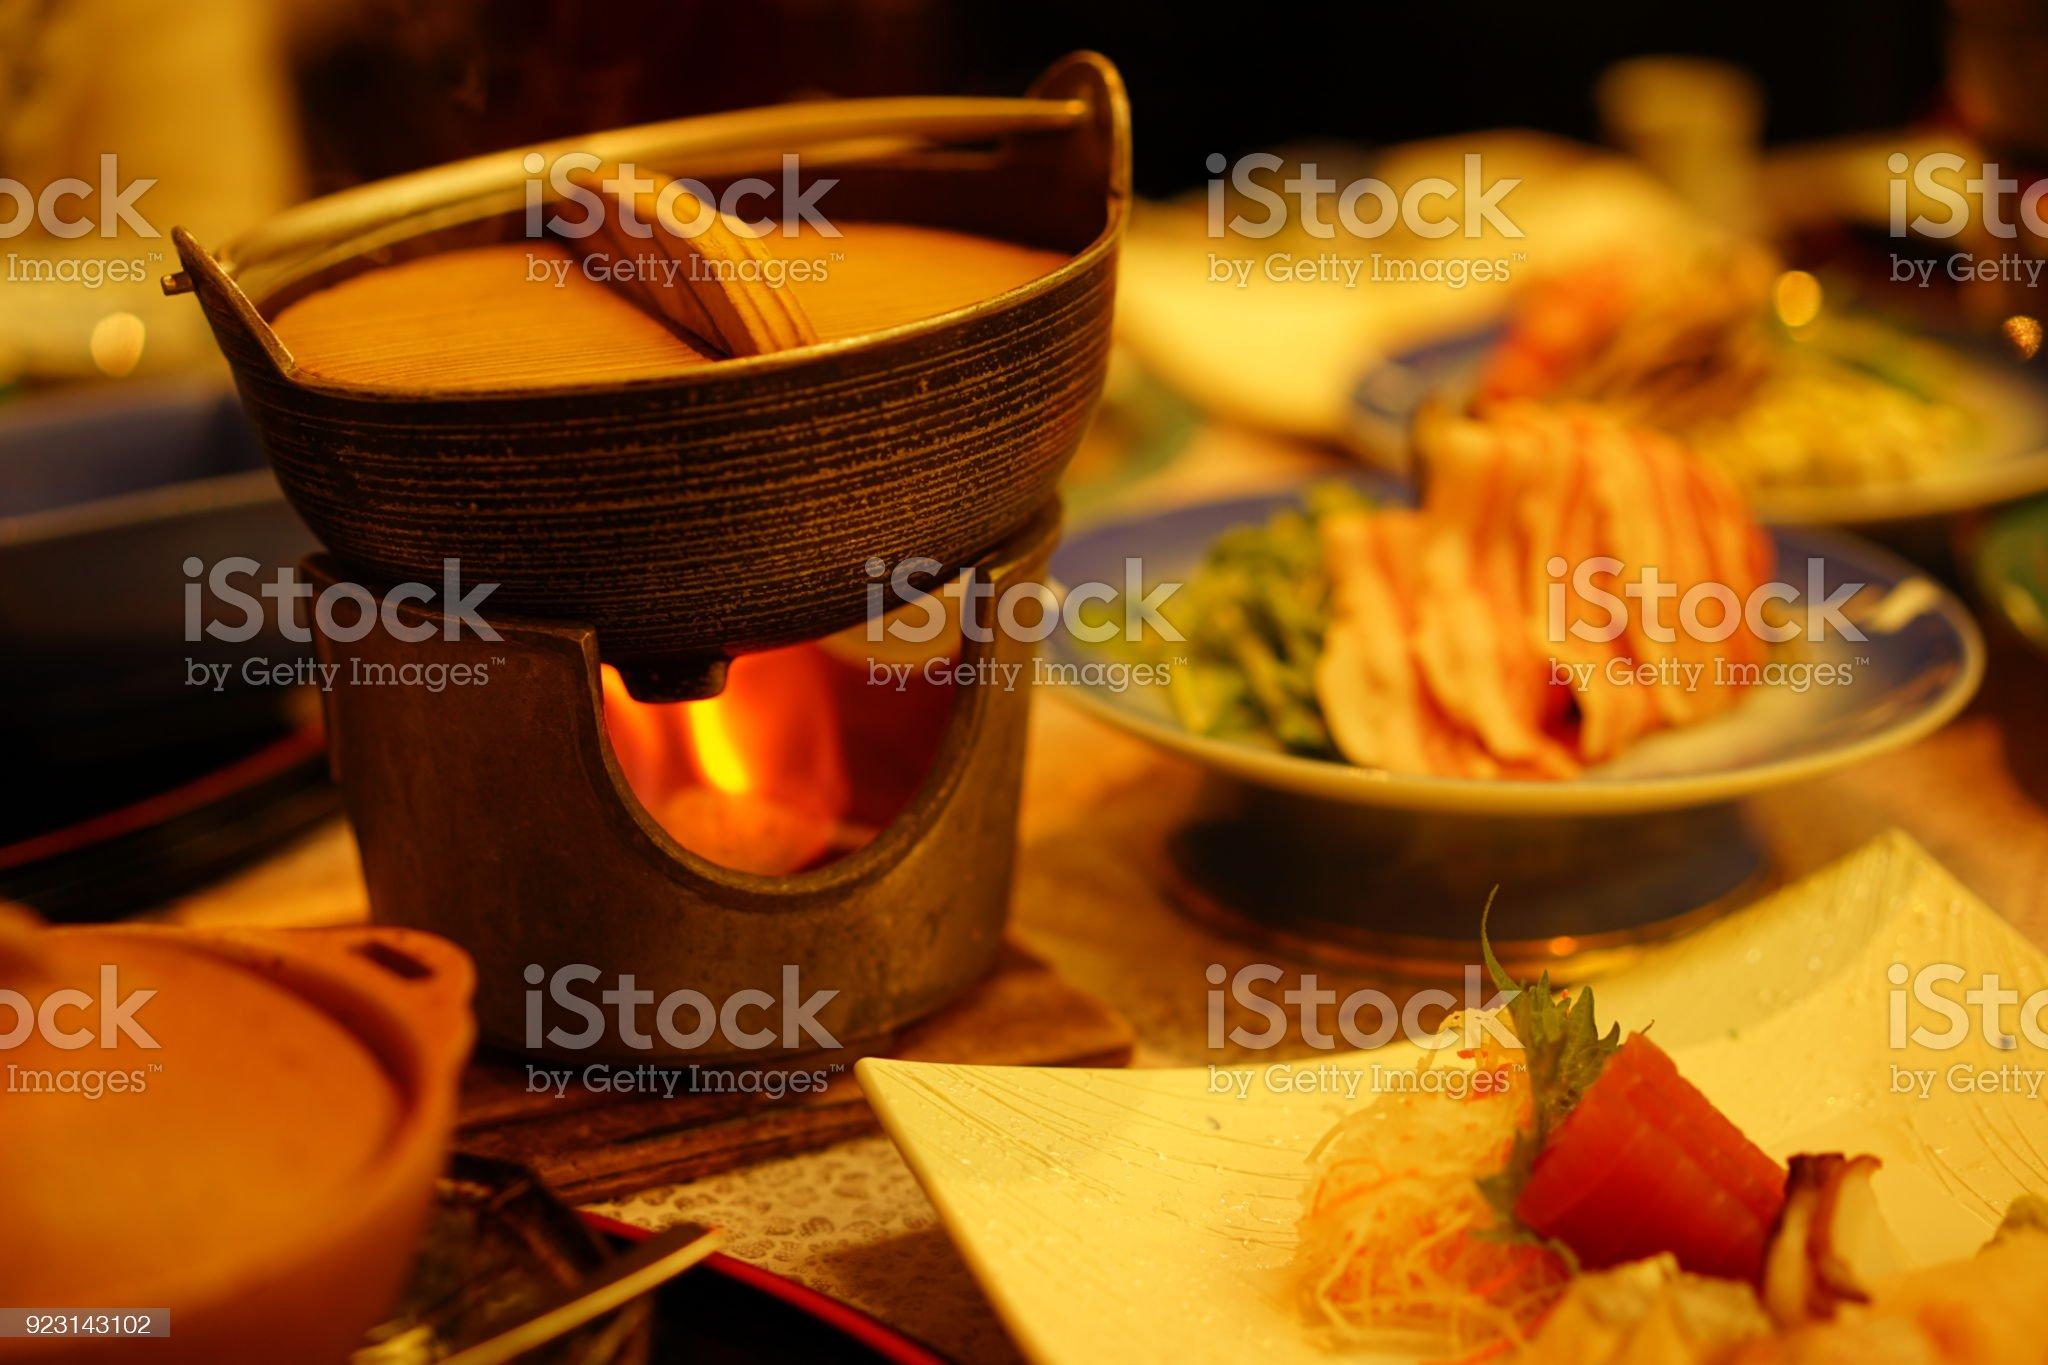 https://media.istockphoto.com/photos/japanese-food-picture-id923143102?s=2048x2048